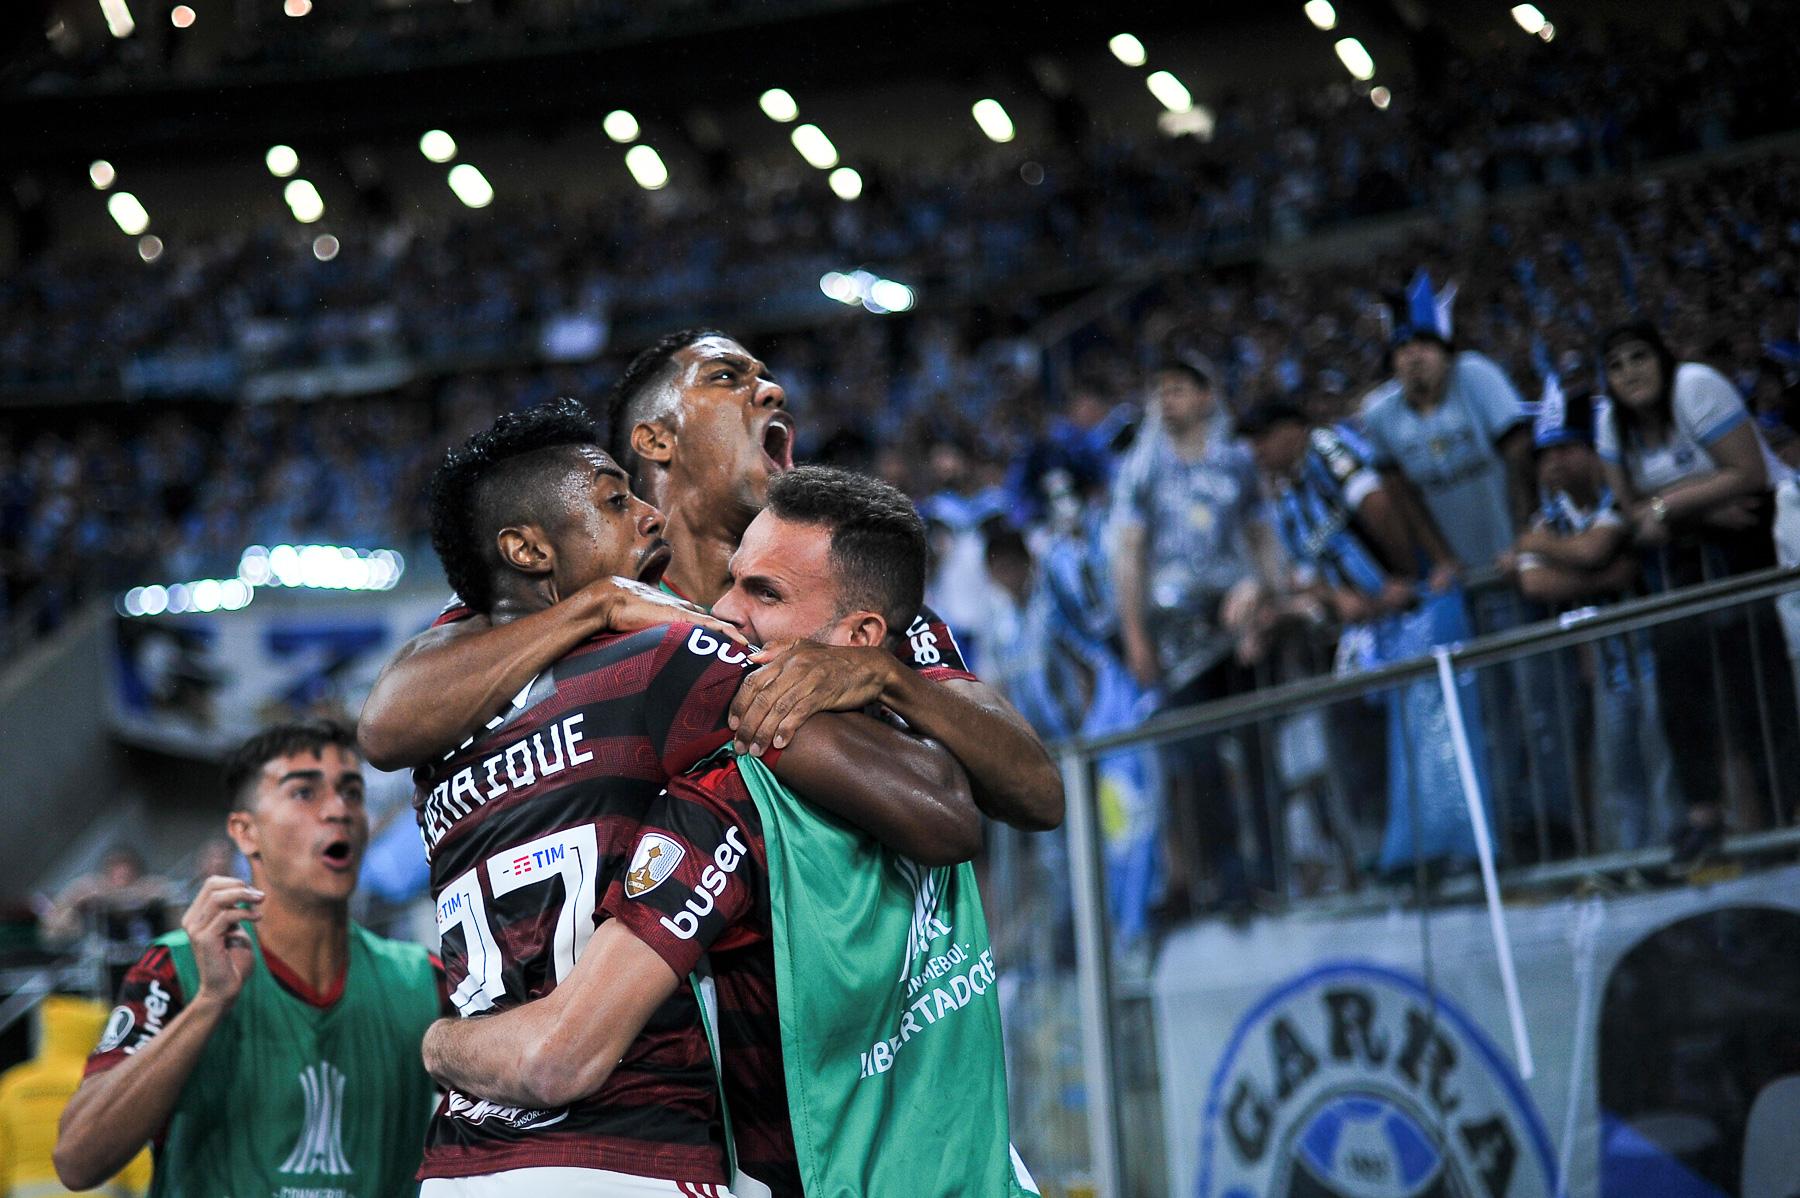 Gremio_X_Flamengo_dudabairros_Eleven_172